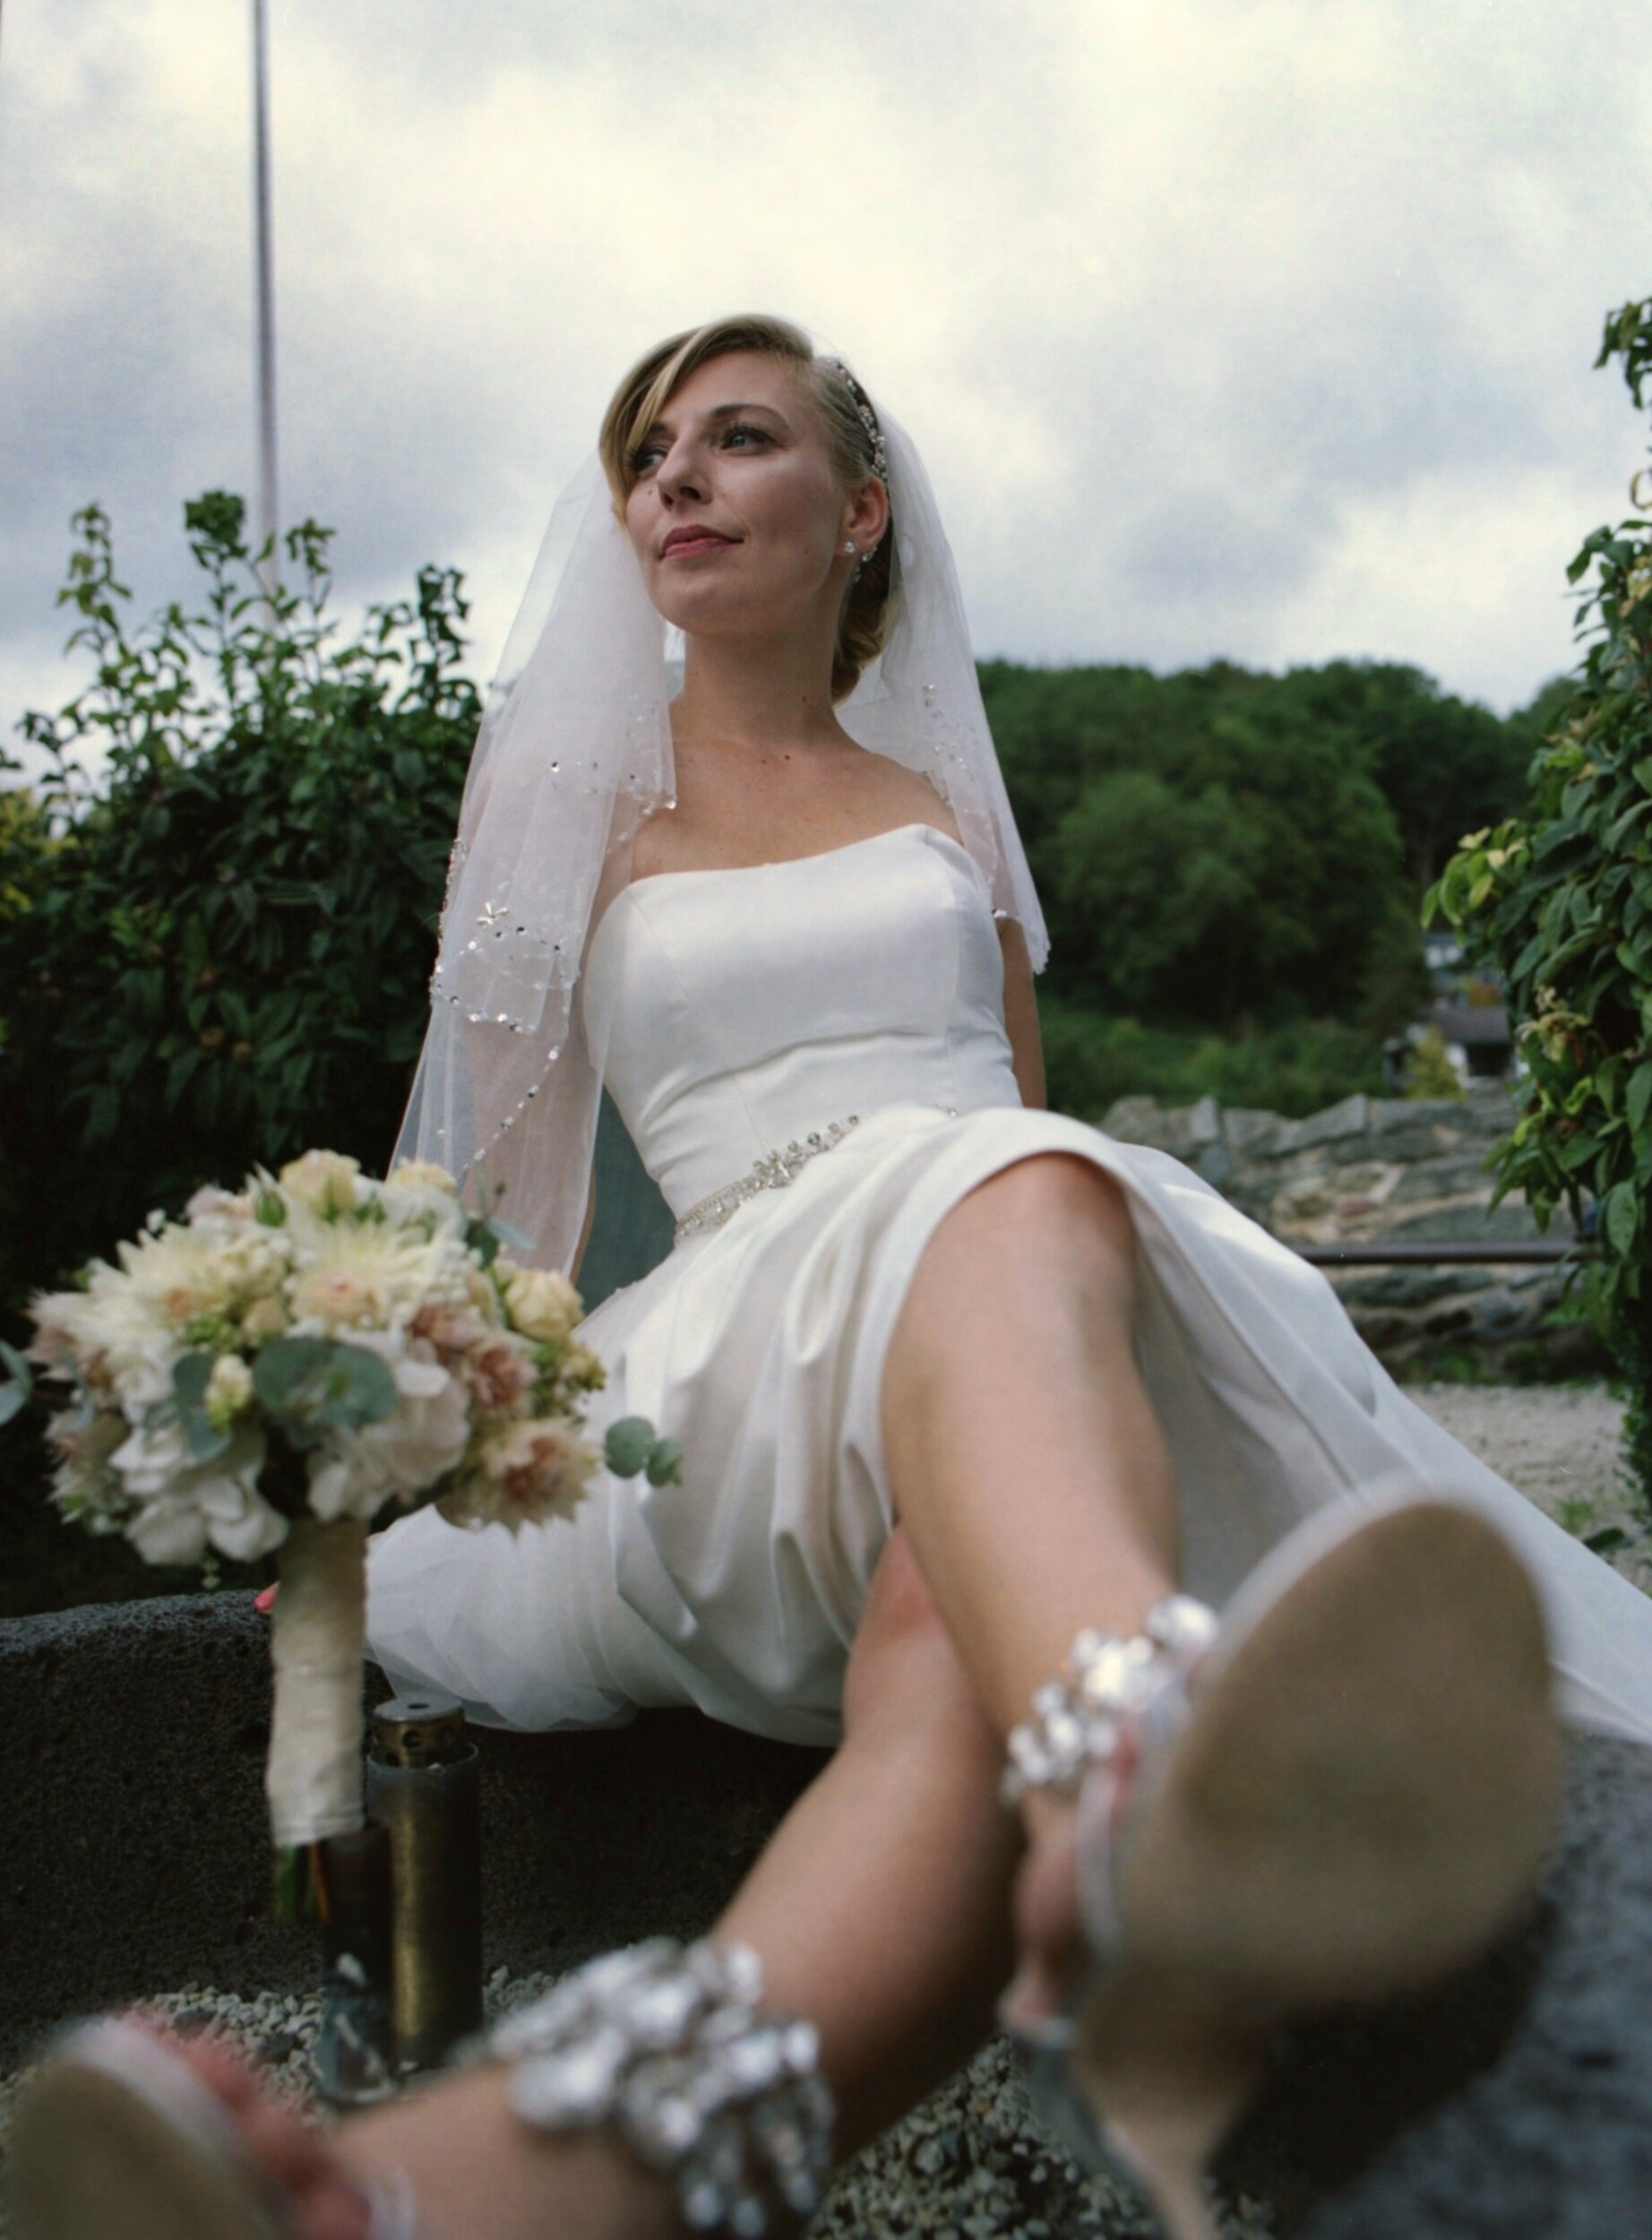 processed_WeddingSelection_film_010_SMALL-01-01.jpeg